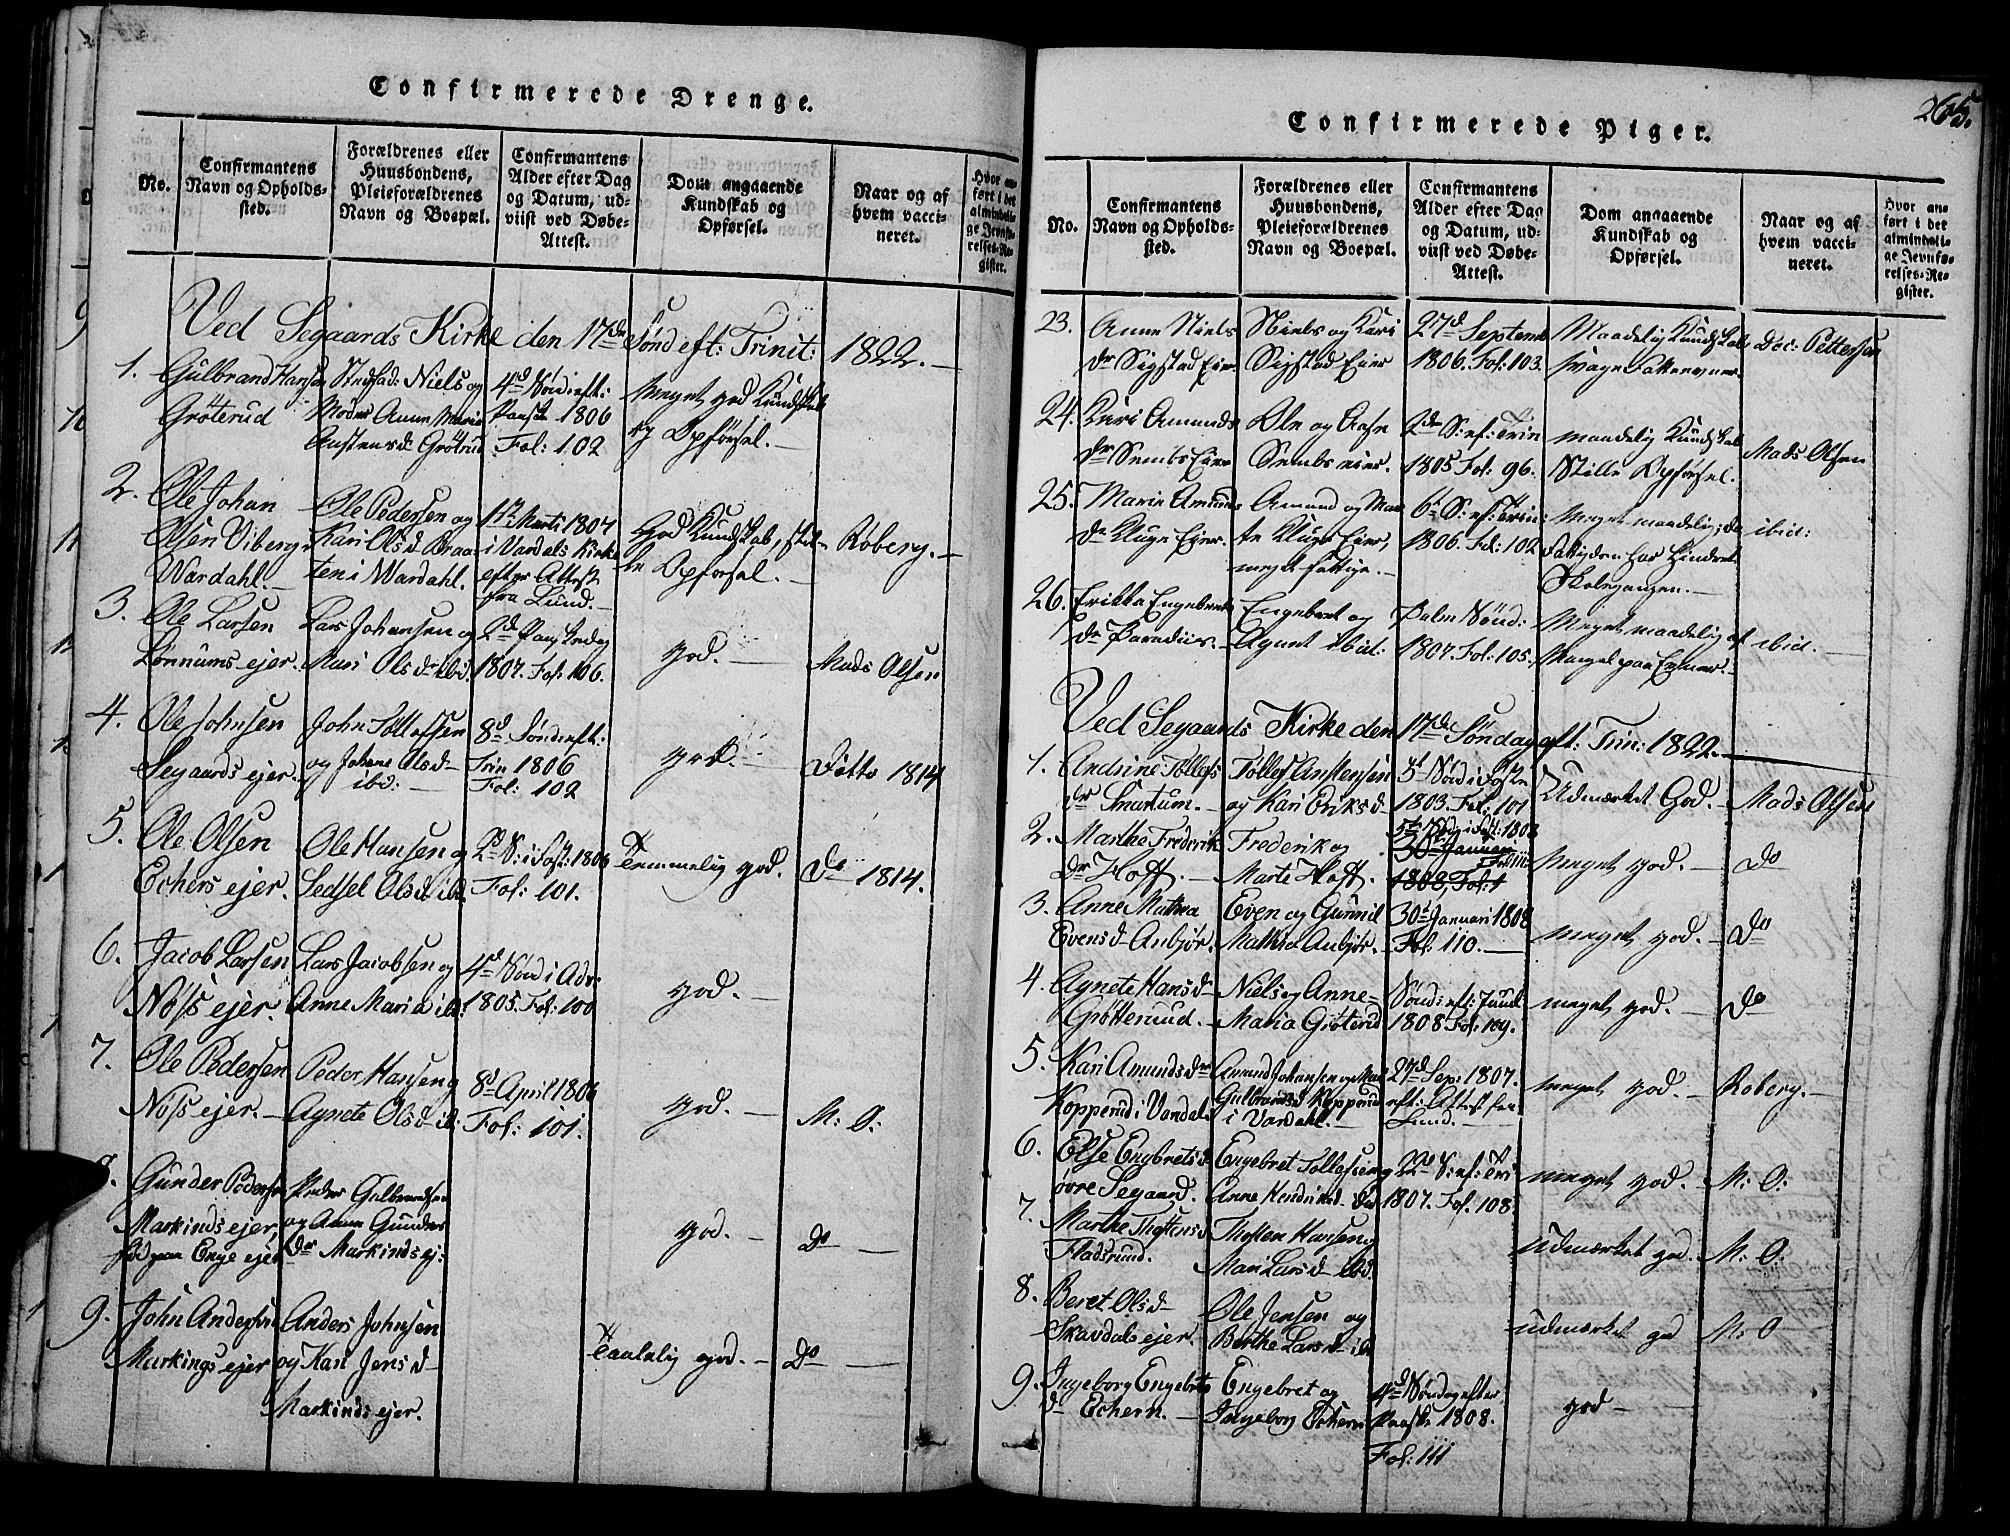 SAH, Biri prestekontor, Ministerialbok nr. 3, 1814-1828, s. 265